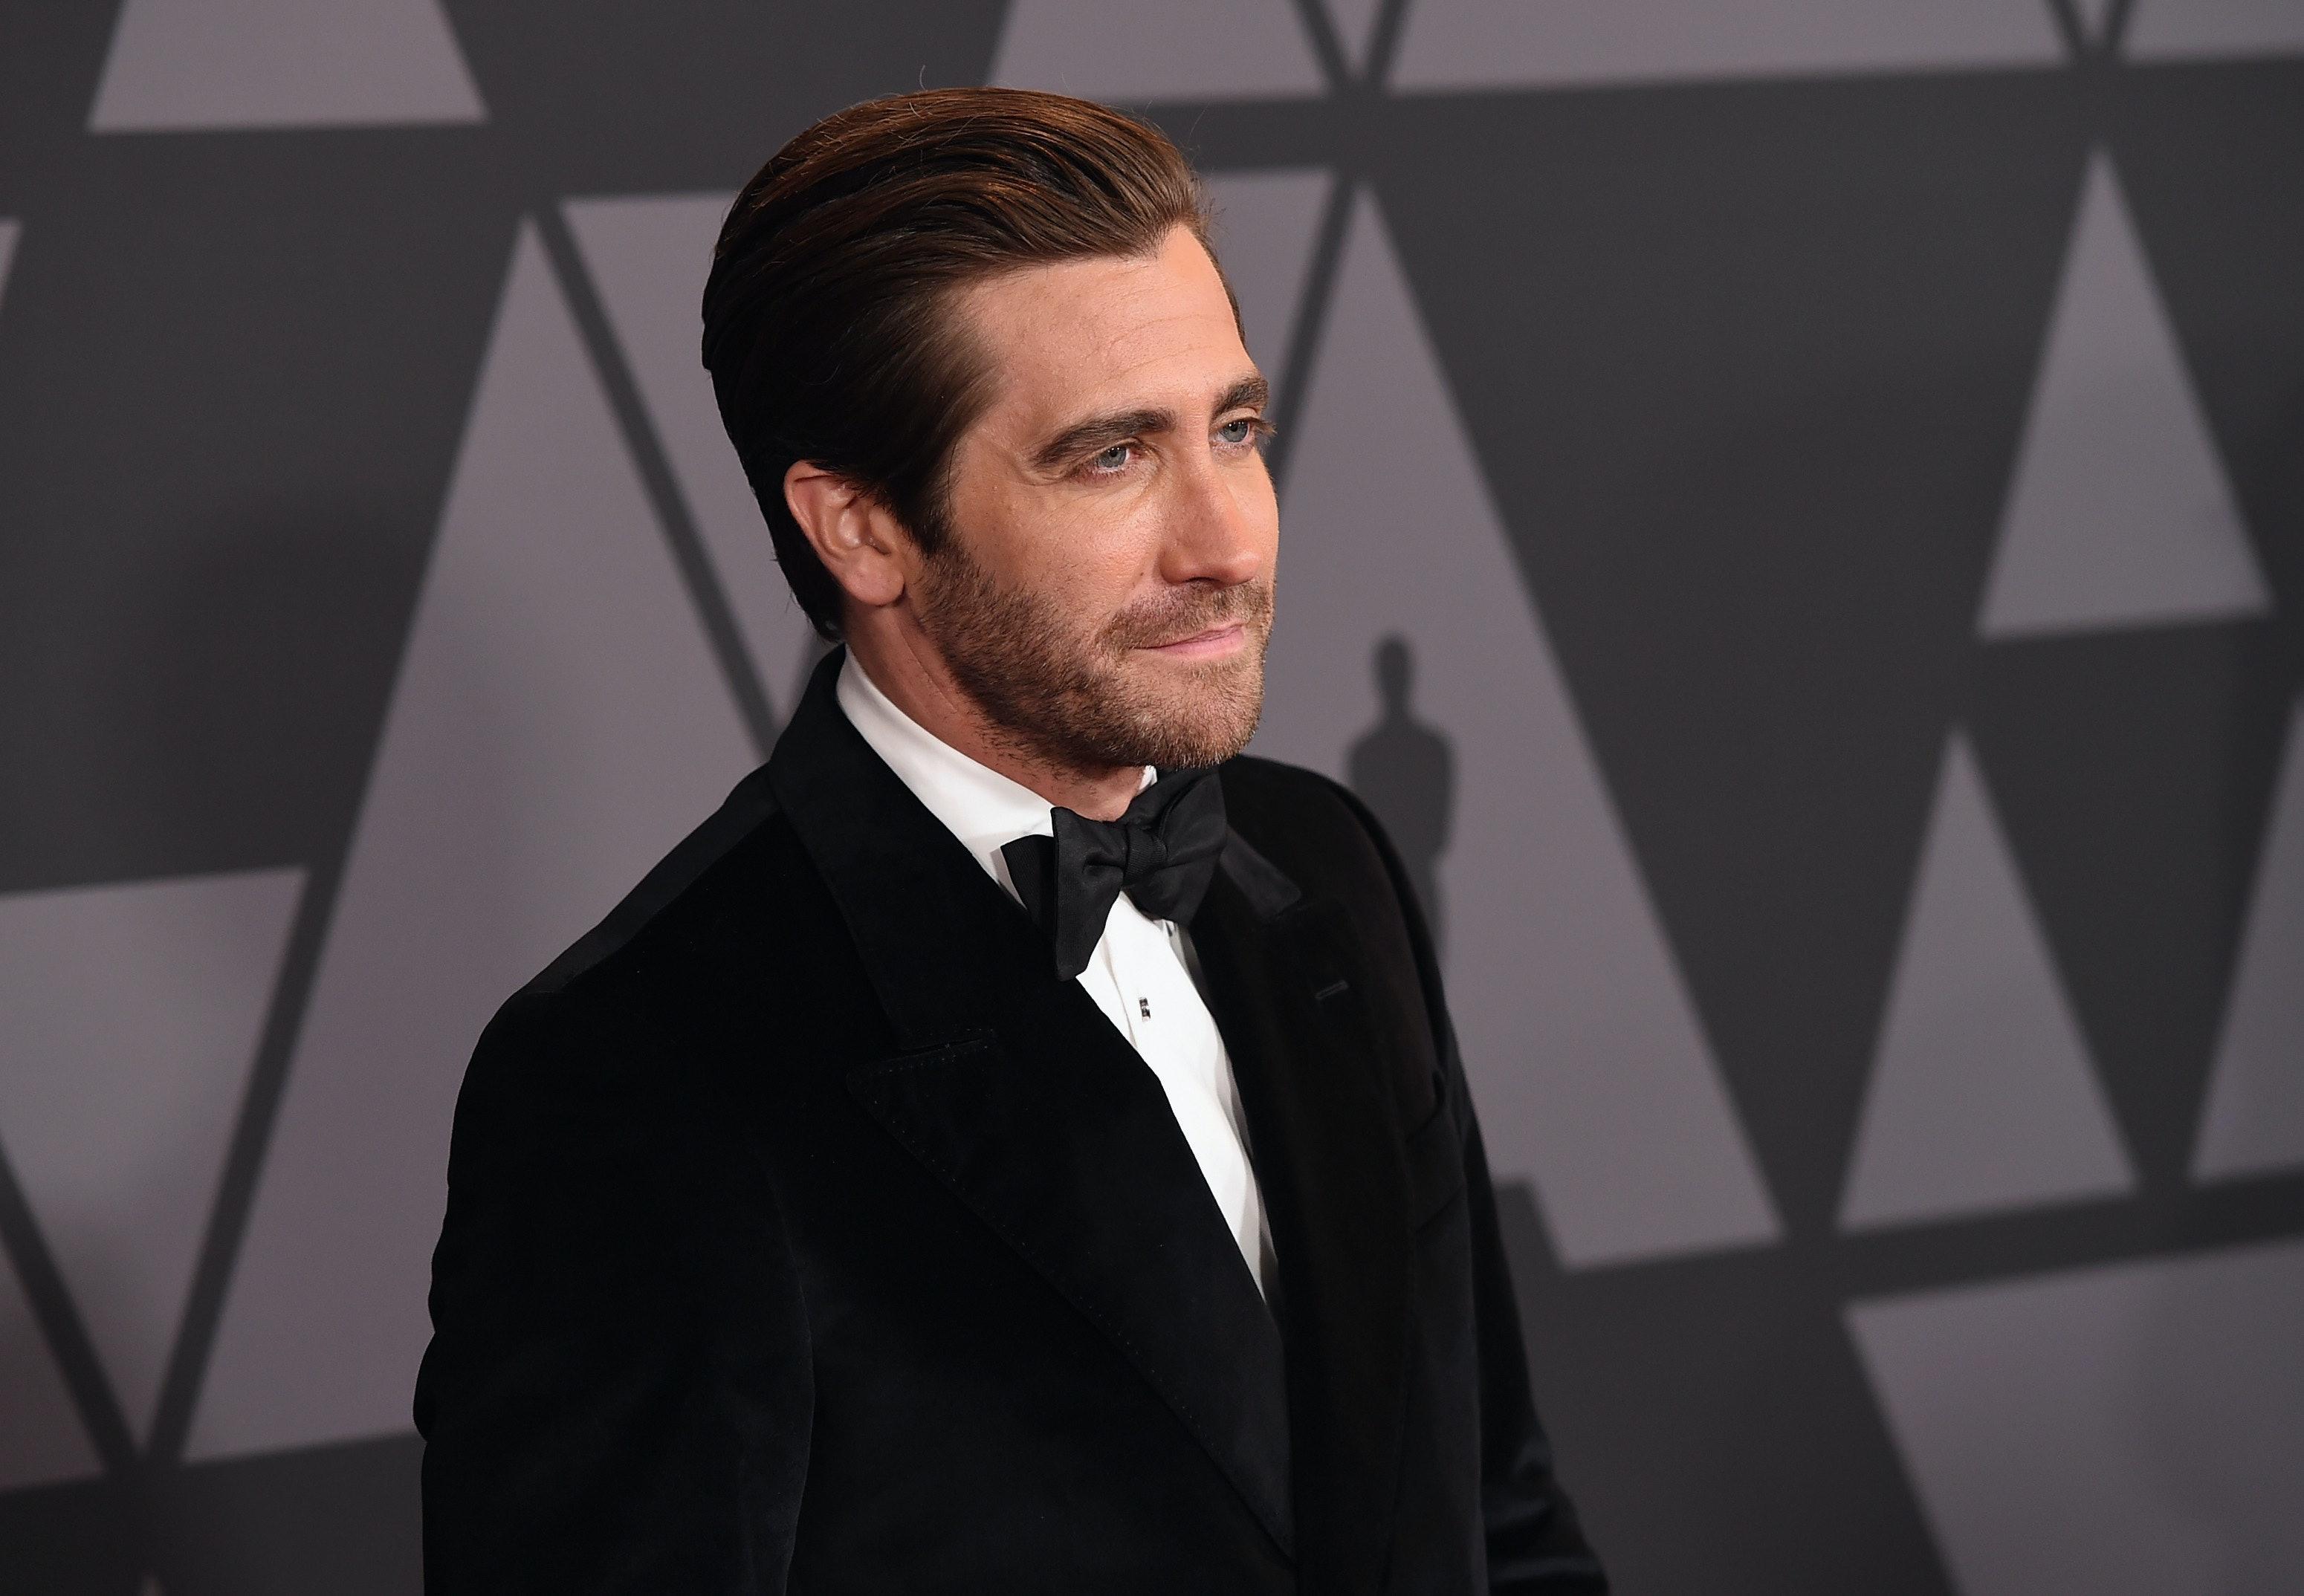 Tobey maguire looks like jake gyllenhaal dating